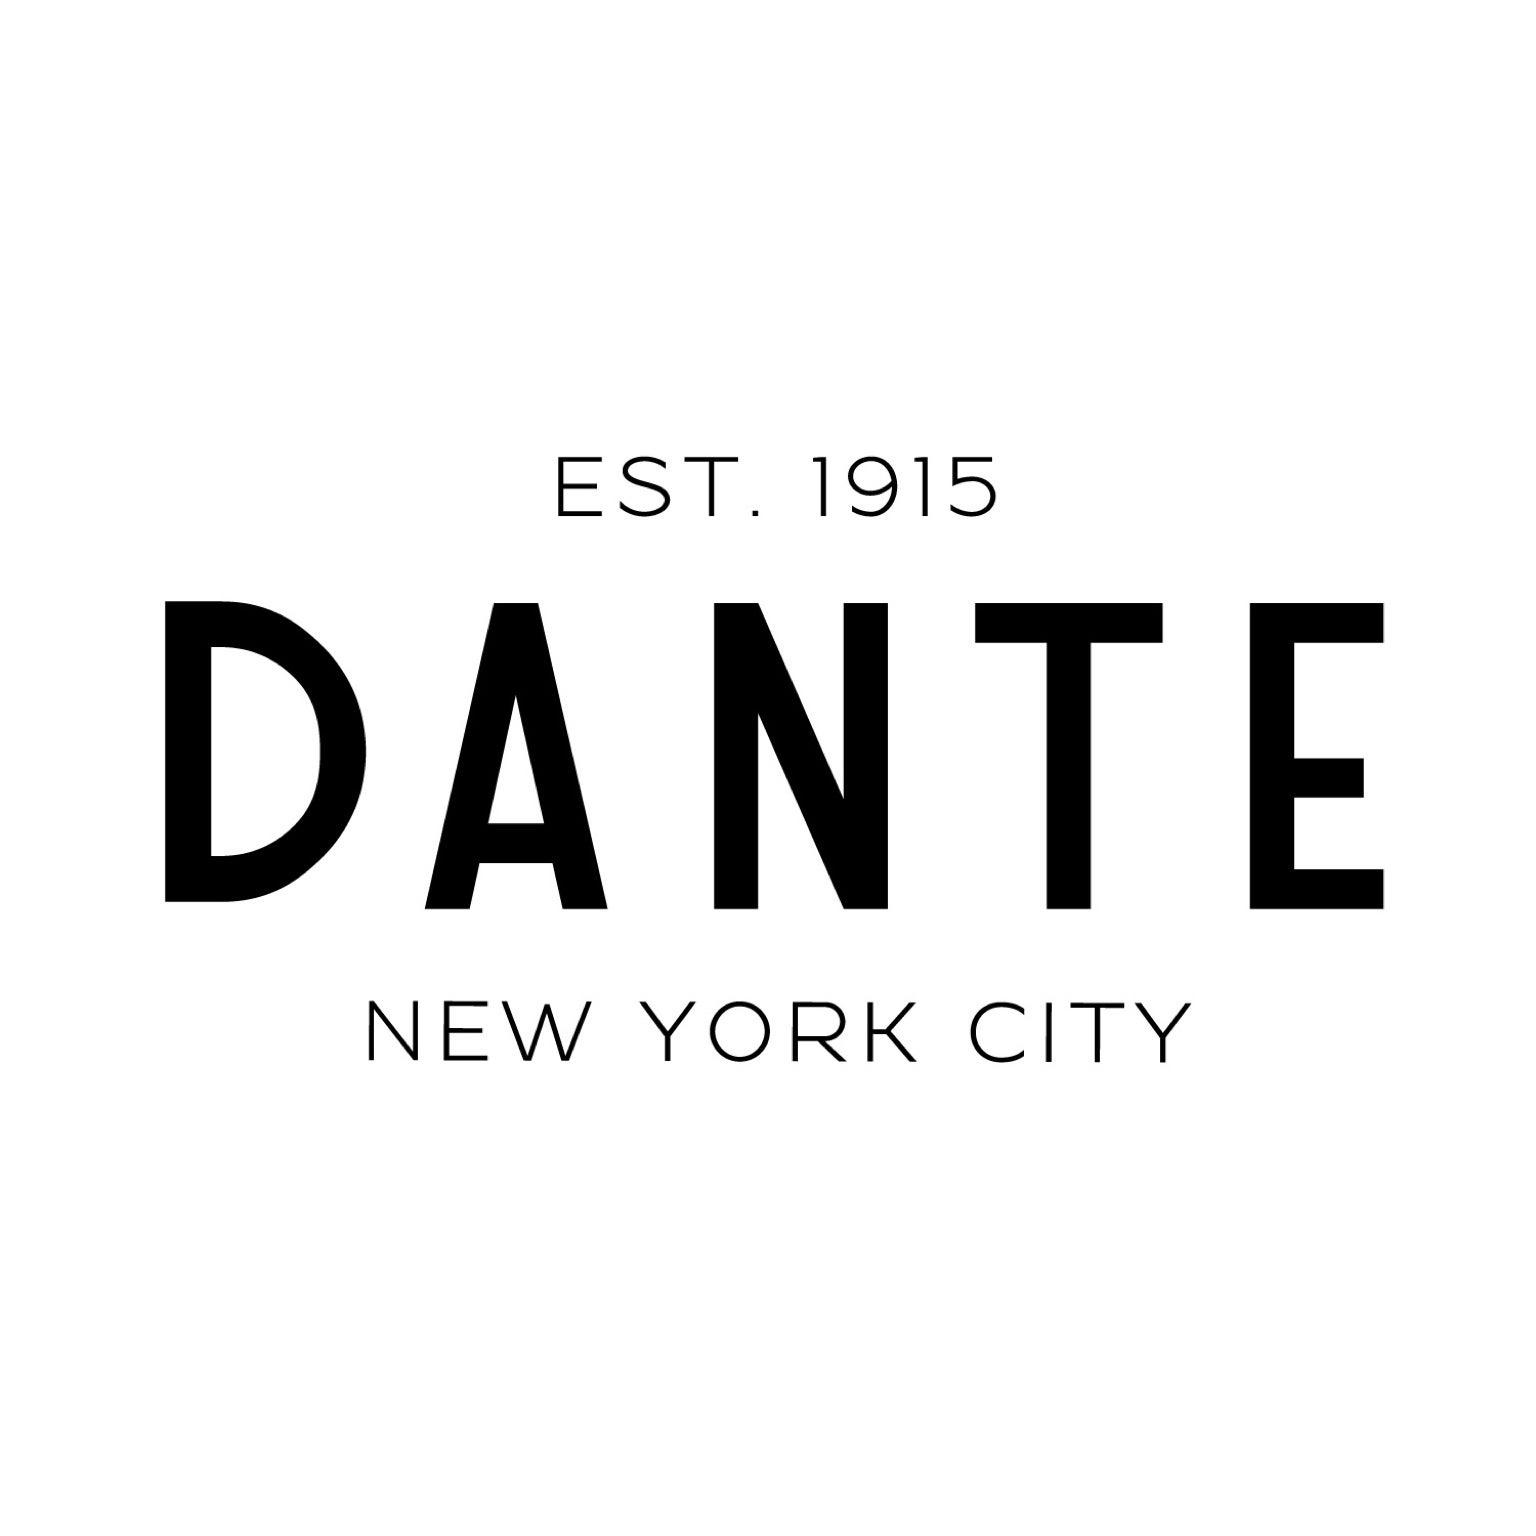 Dante at 79-81 Macdougal St (btw Bleecker and W. Houston) New York ...